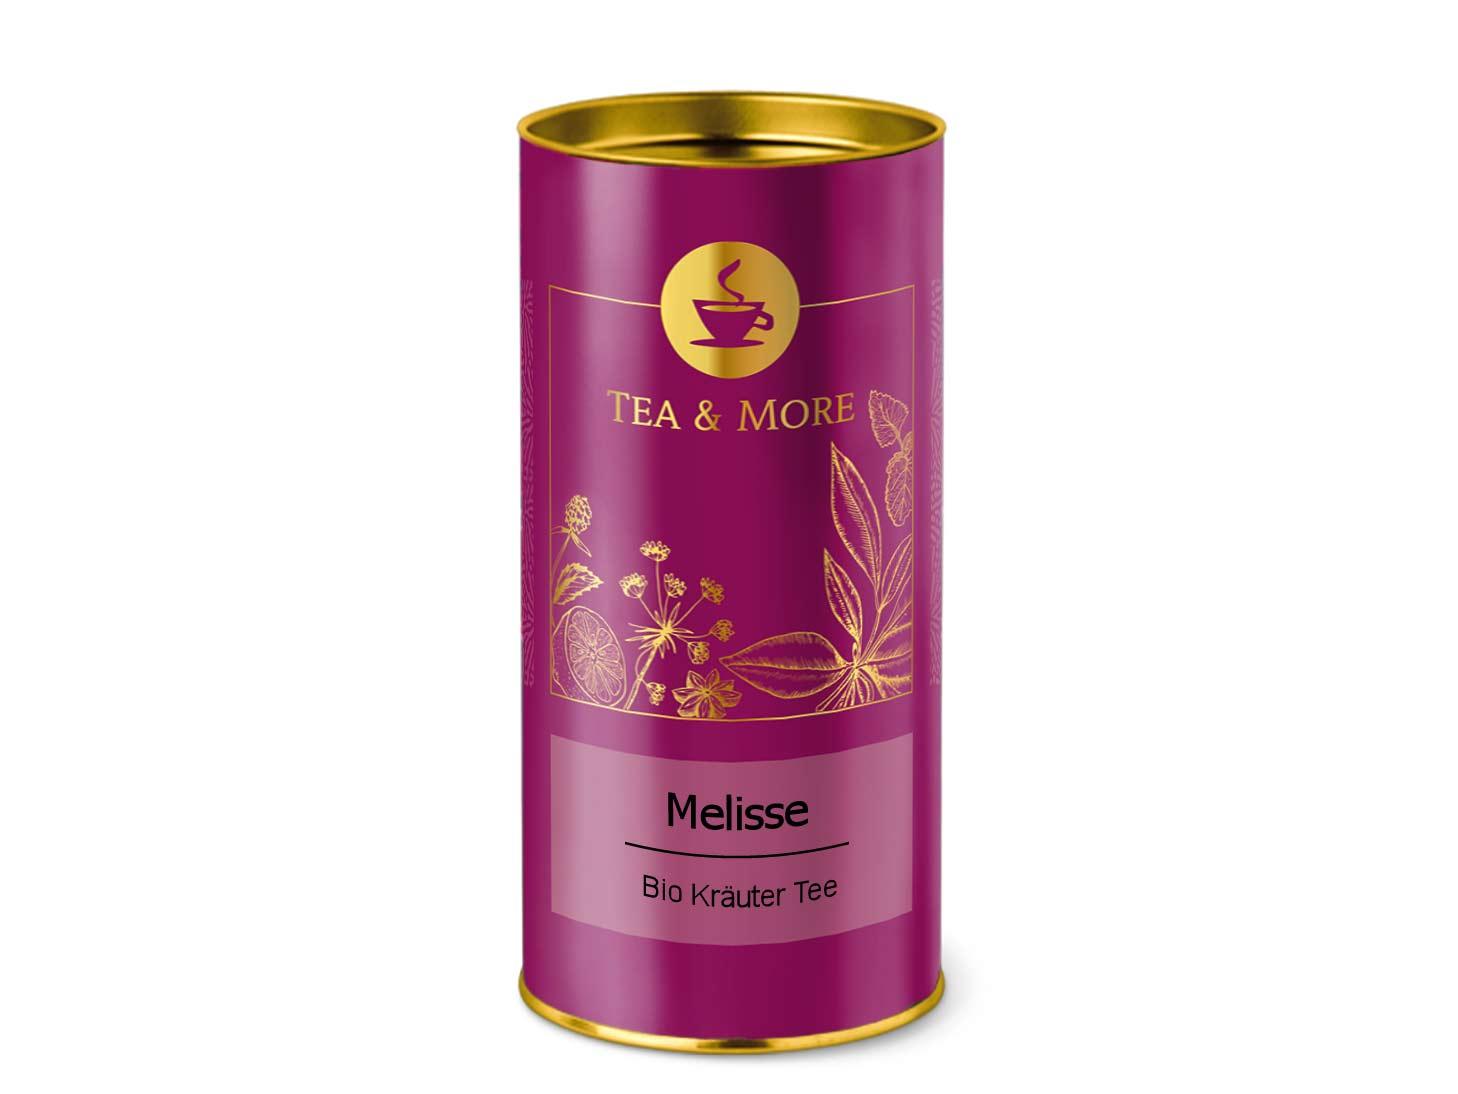 Melisse (Melissa officinalis) (Bio)